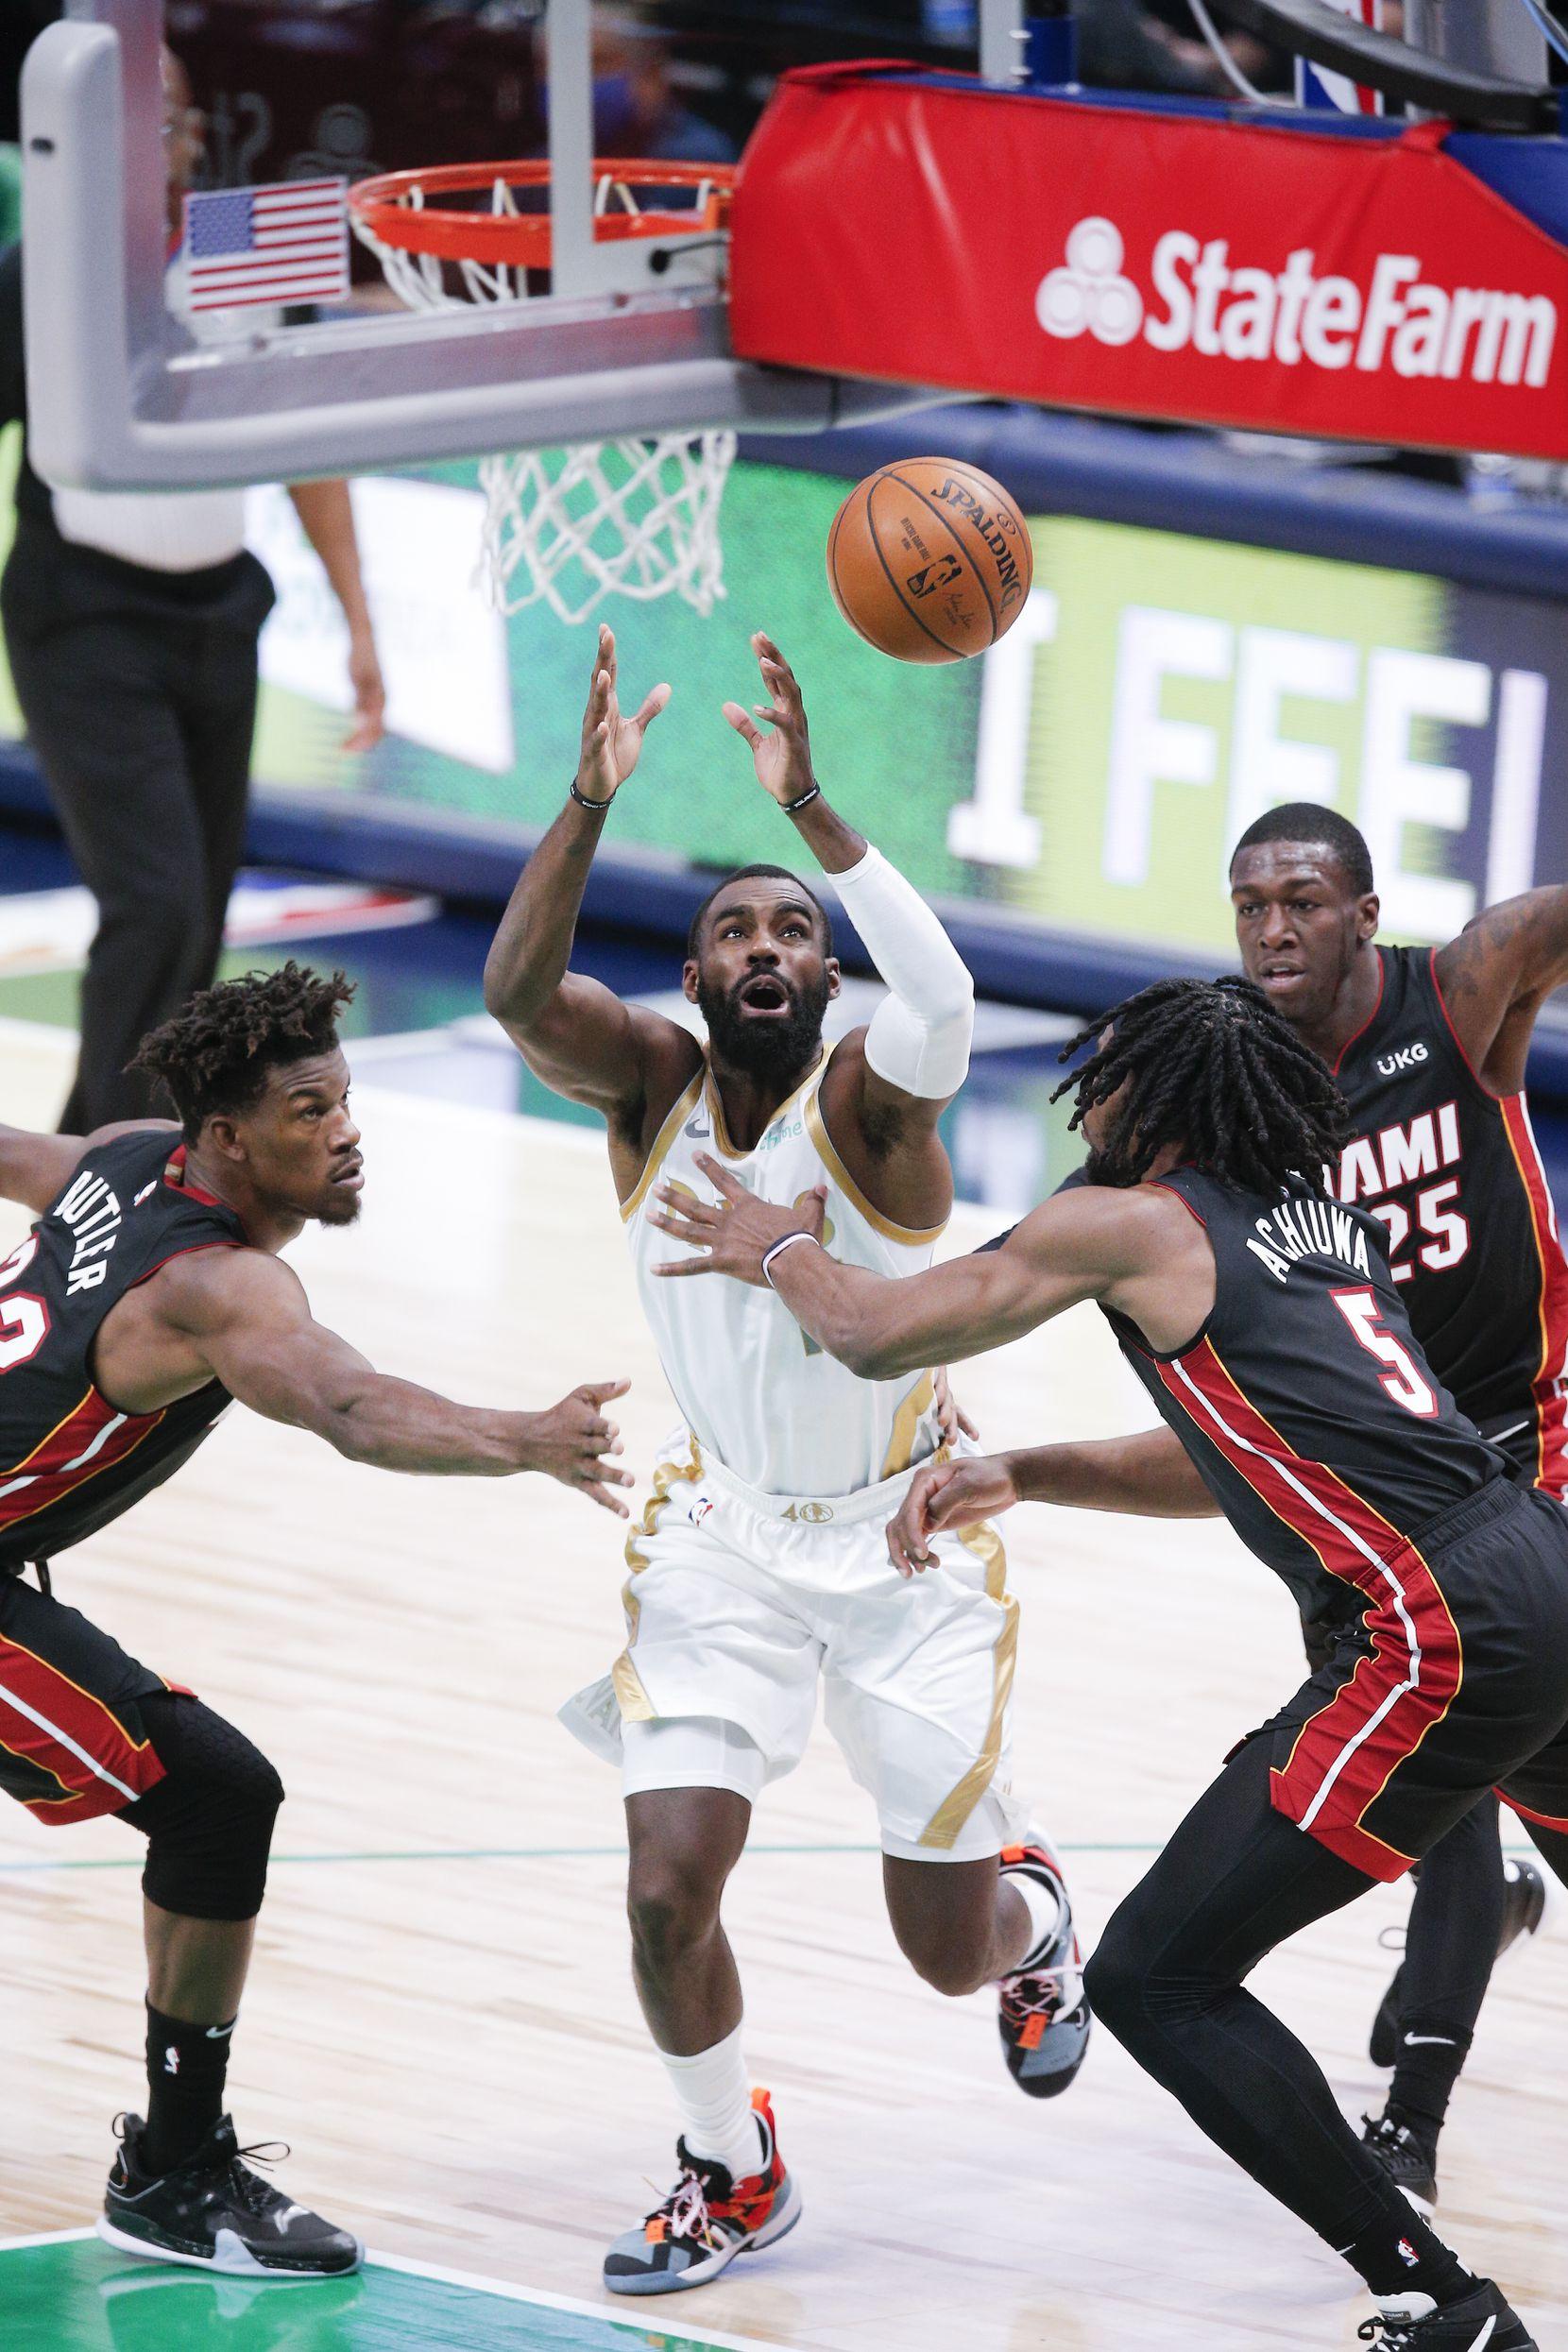 Dallas Mavericks guard Tim Hardaway Jr. (11) loses his grip on the ball as Miami Heat forwards Jimmy Butler, left, Precious Achiuwa (5) and guard Kendrick Nunn (25) defend  during the first half of an NBA basketball game, Friday, January 1, 2021. (Brandon Wade/Special Contributor)